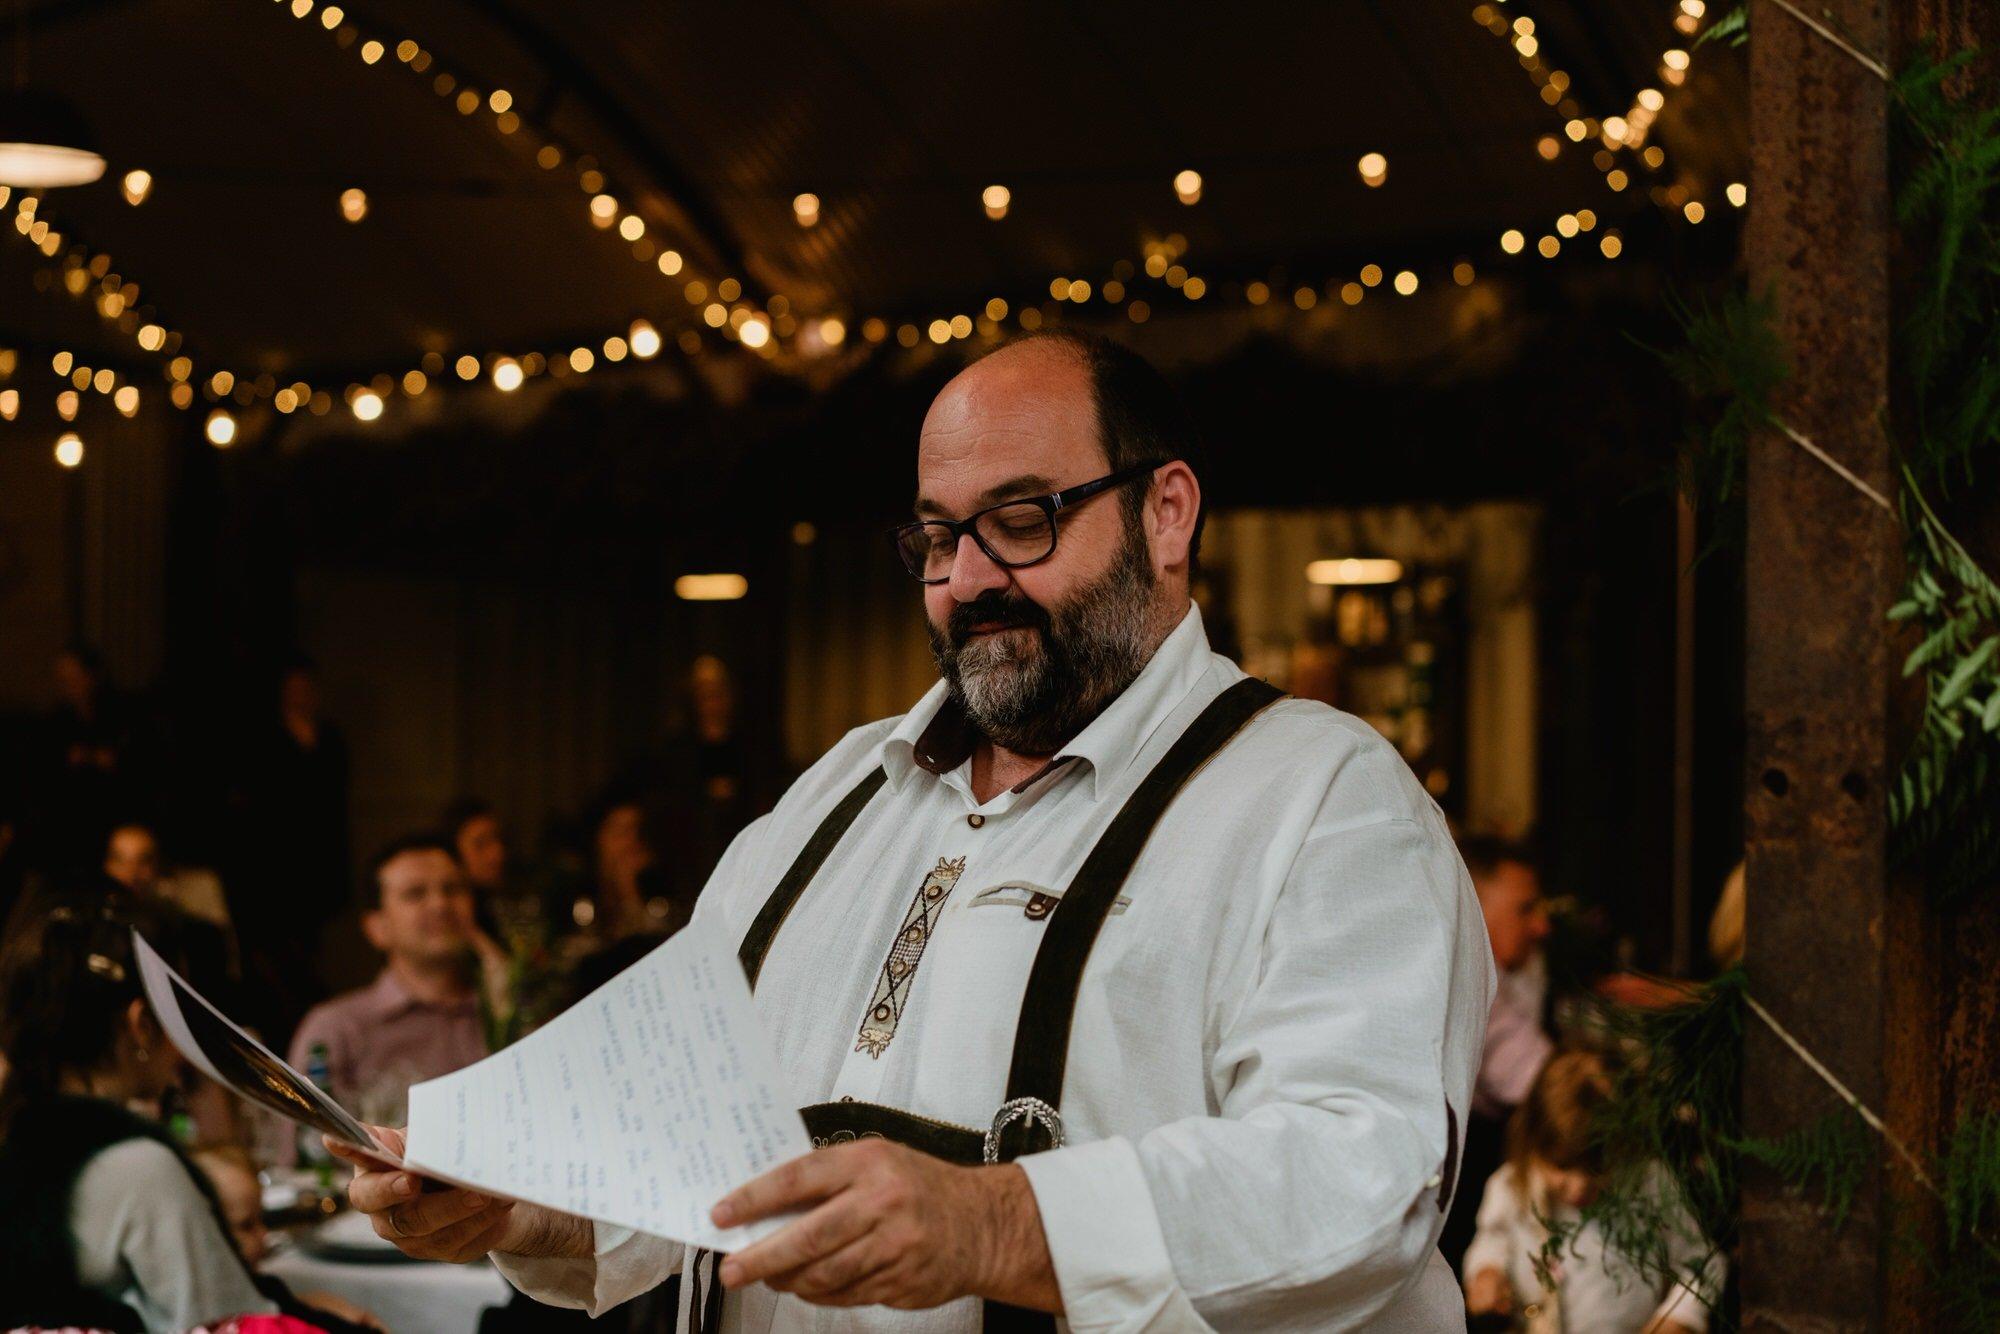 047 TIN SHED KNOCKRAICH WEDDING AUSTRIAN SCOTTISH ZOE ALEXANDRA PHOTOGRAPHY